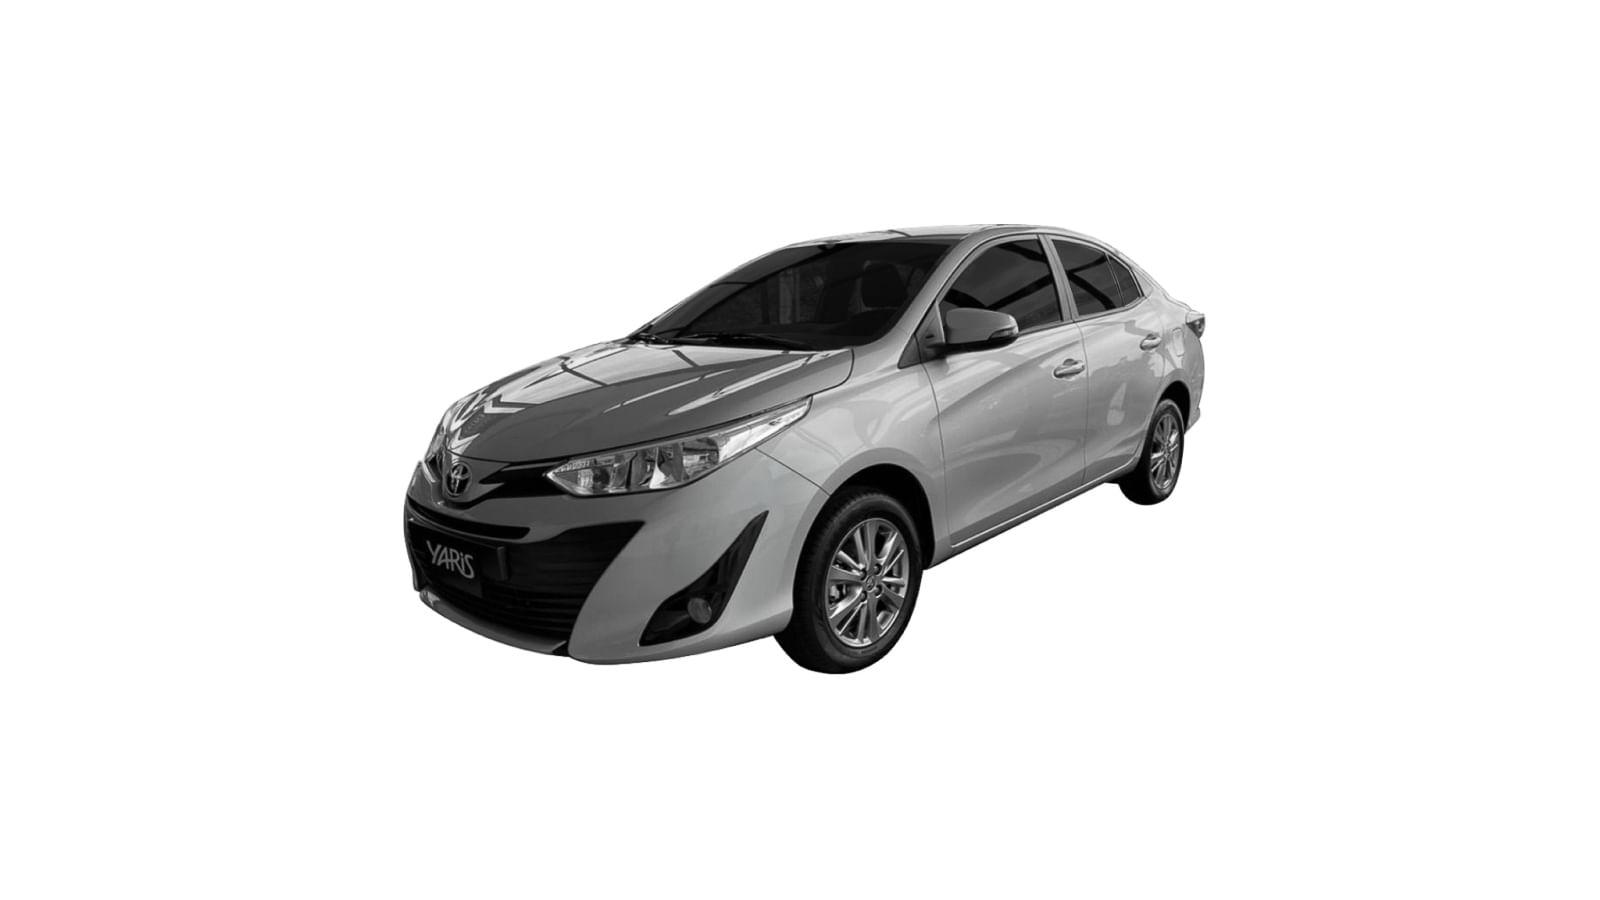 Toyota-Yaris-XS-Sedan-AT-02012284-1